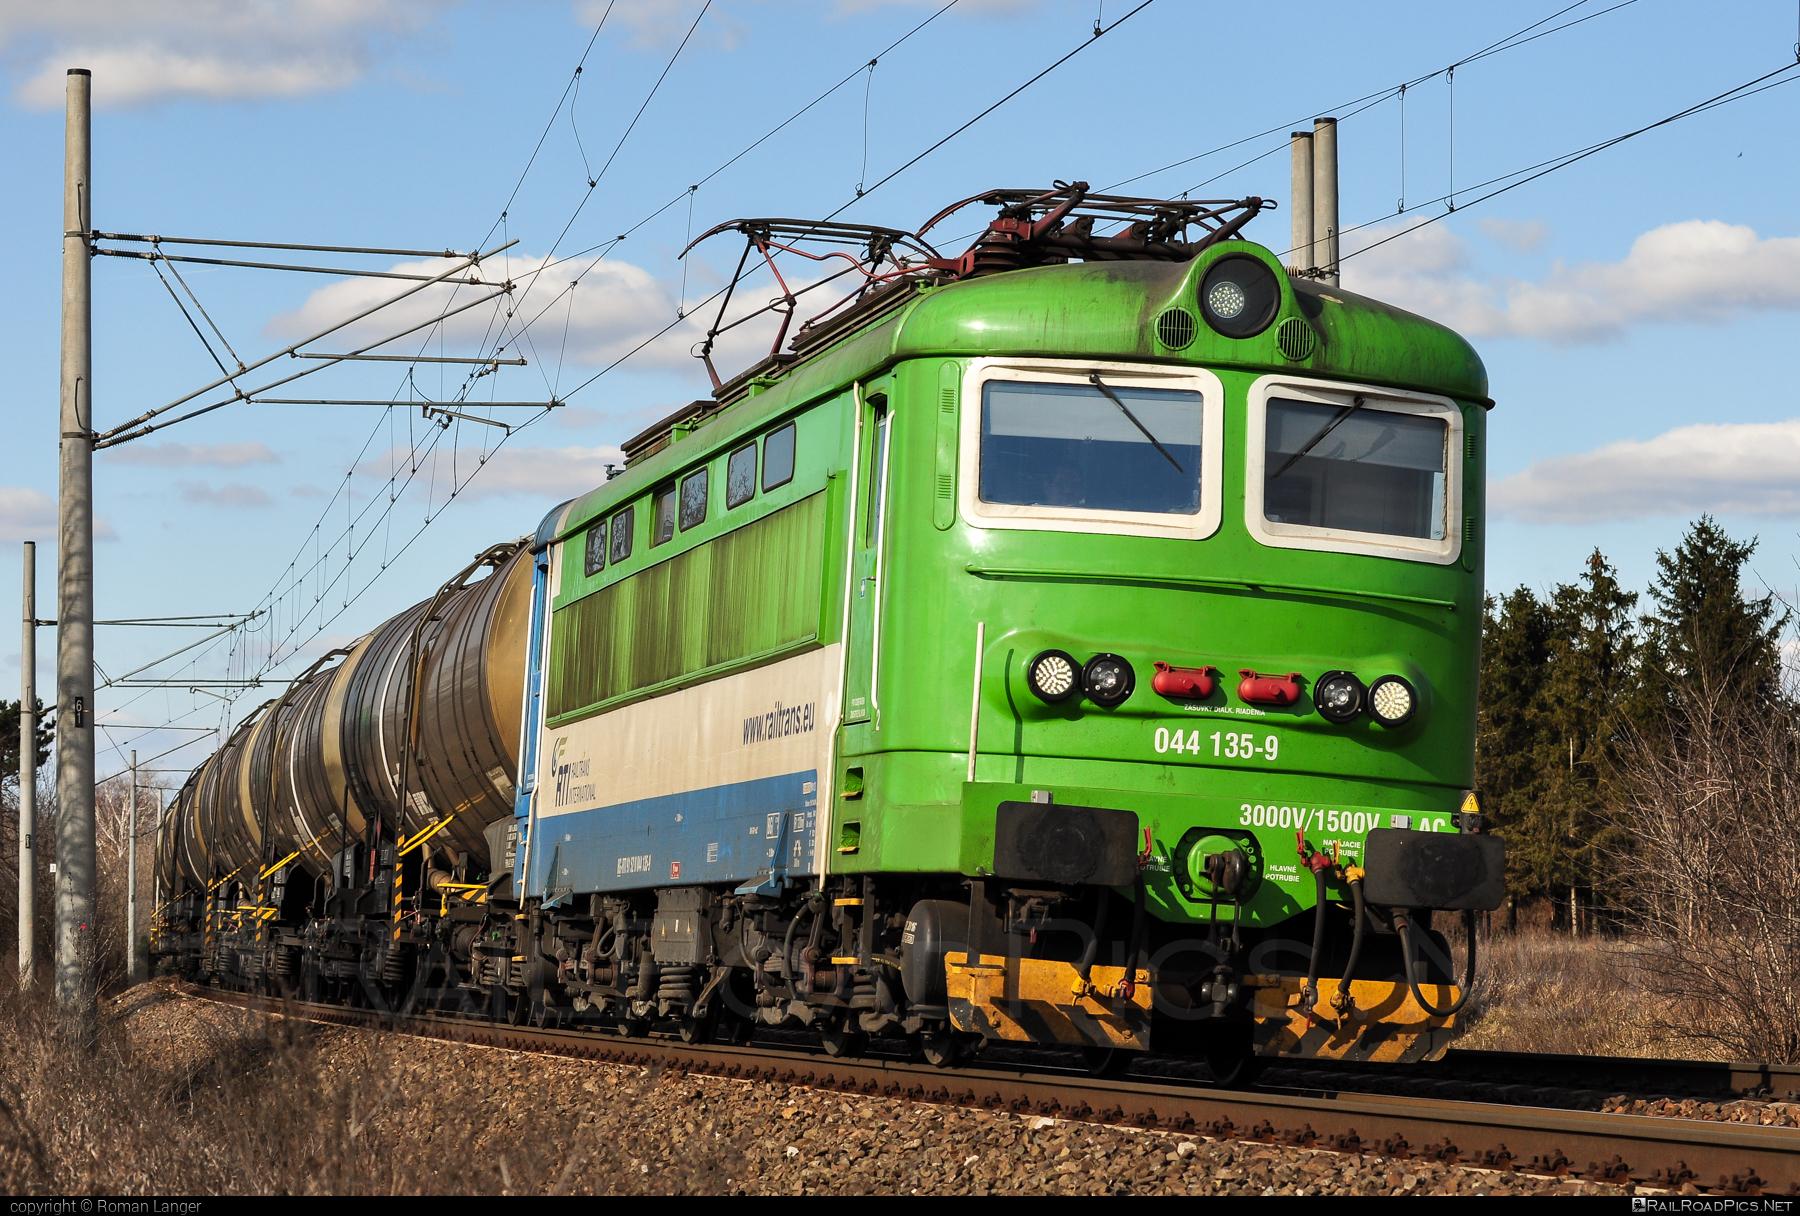 Škoda 73E - 044 135-9 operated by Railtrans International, s.r.o #RailtransInternational #kesselwagen #locomotive242 #plechac #rti #skoda #skoda73e #tankwagon